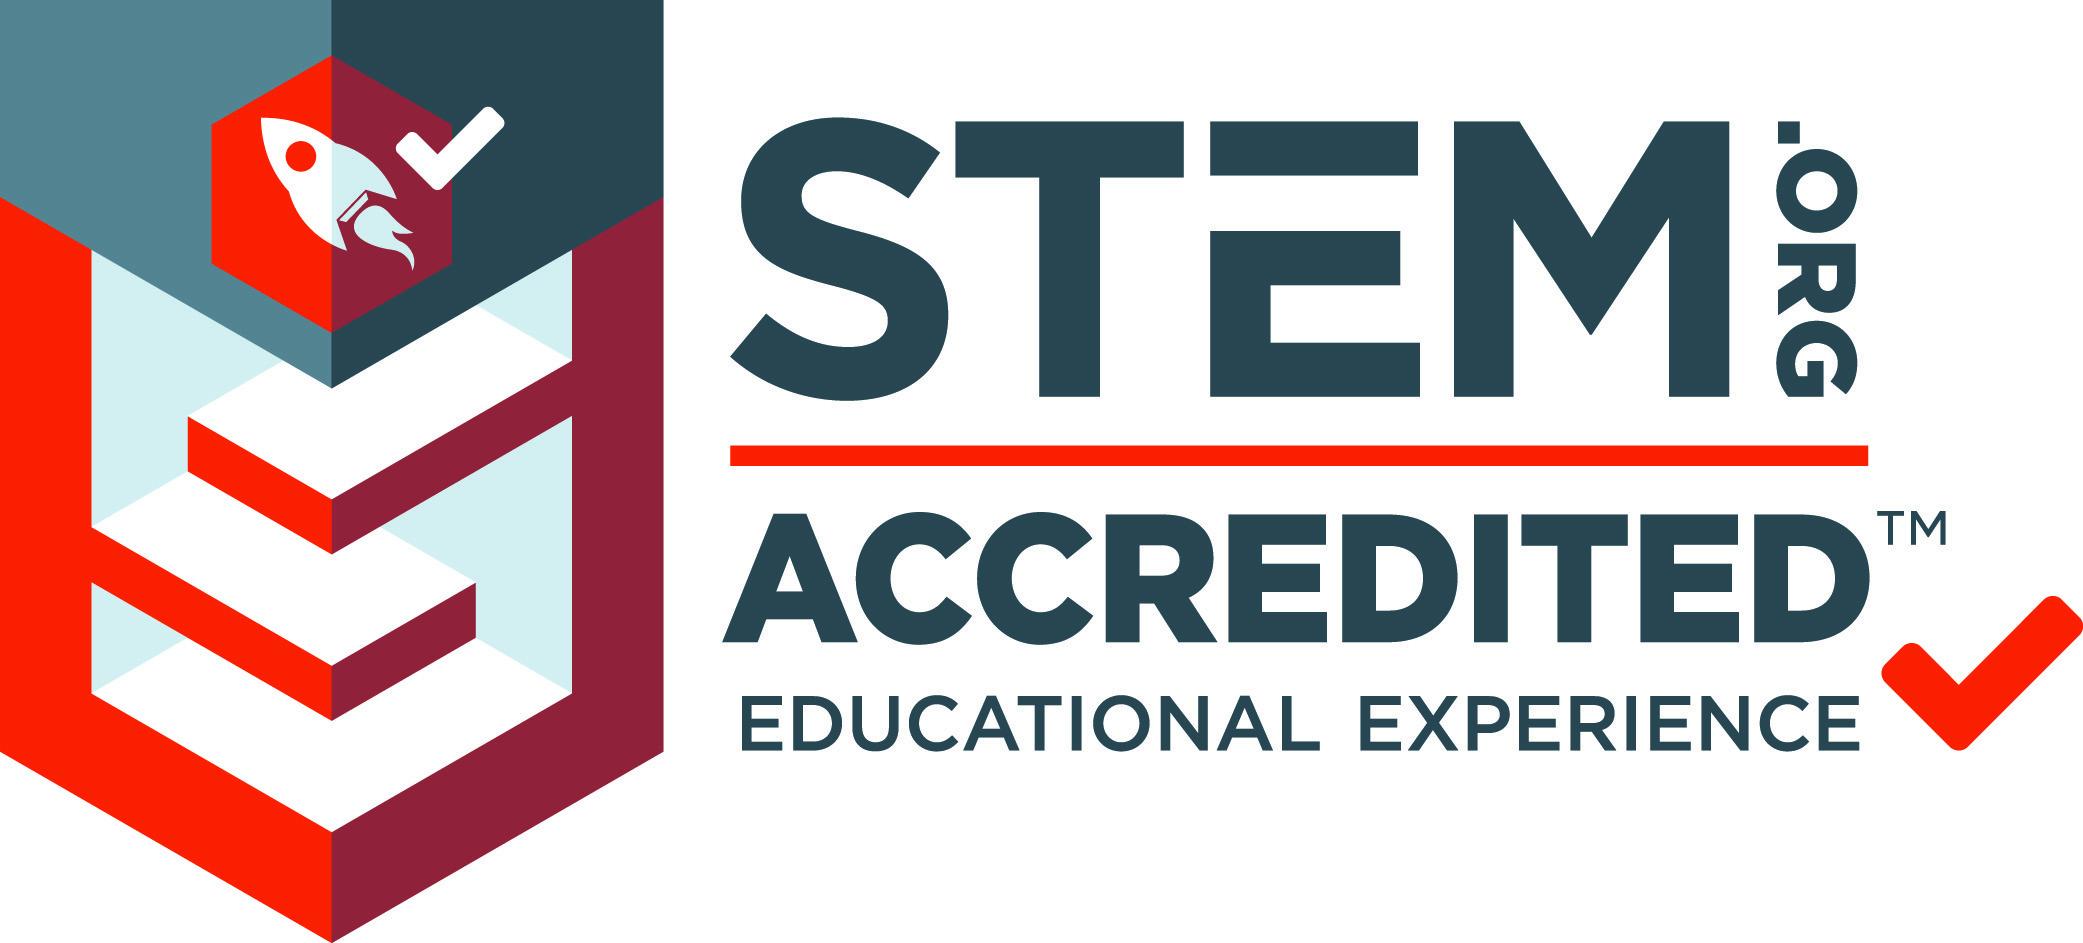 STEM-org_Badge_Accredited-Exp_HOS_POS